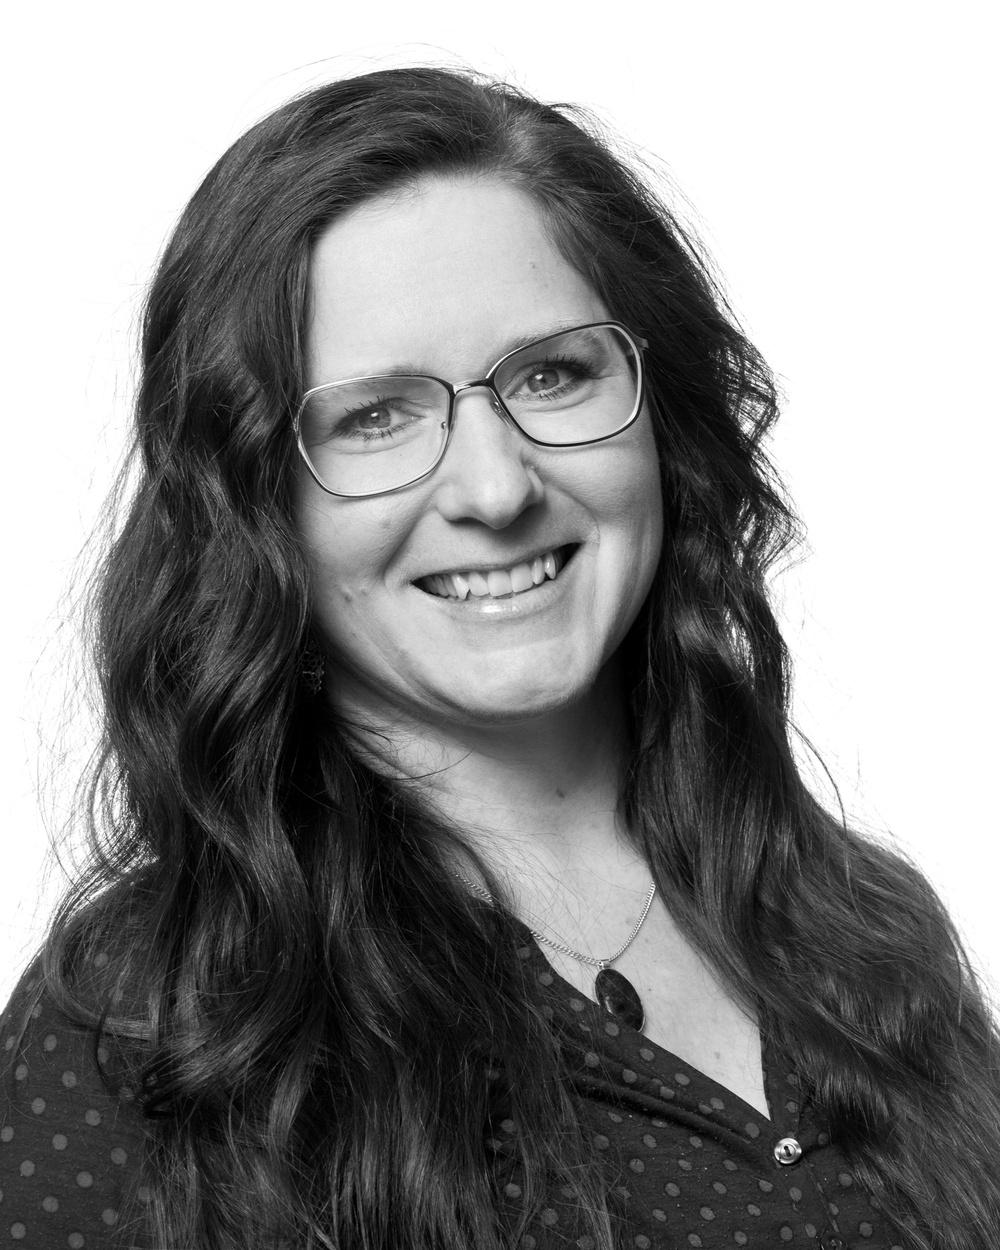 Sofia Lindblom, grafisk formgivare/kommunikatör, Västerbottensteatern. Foto: Patrick Degerman.